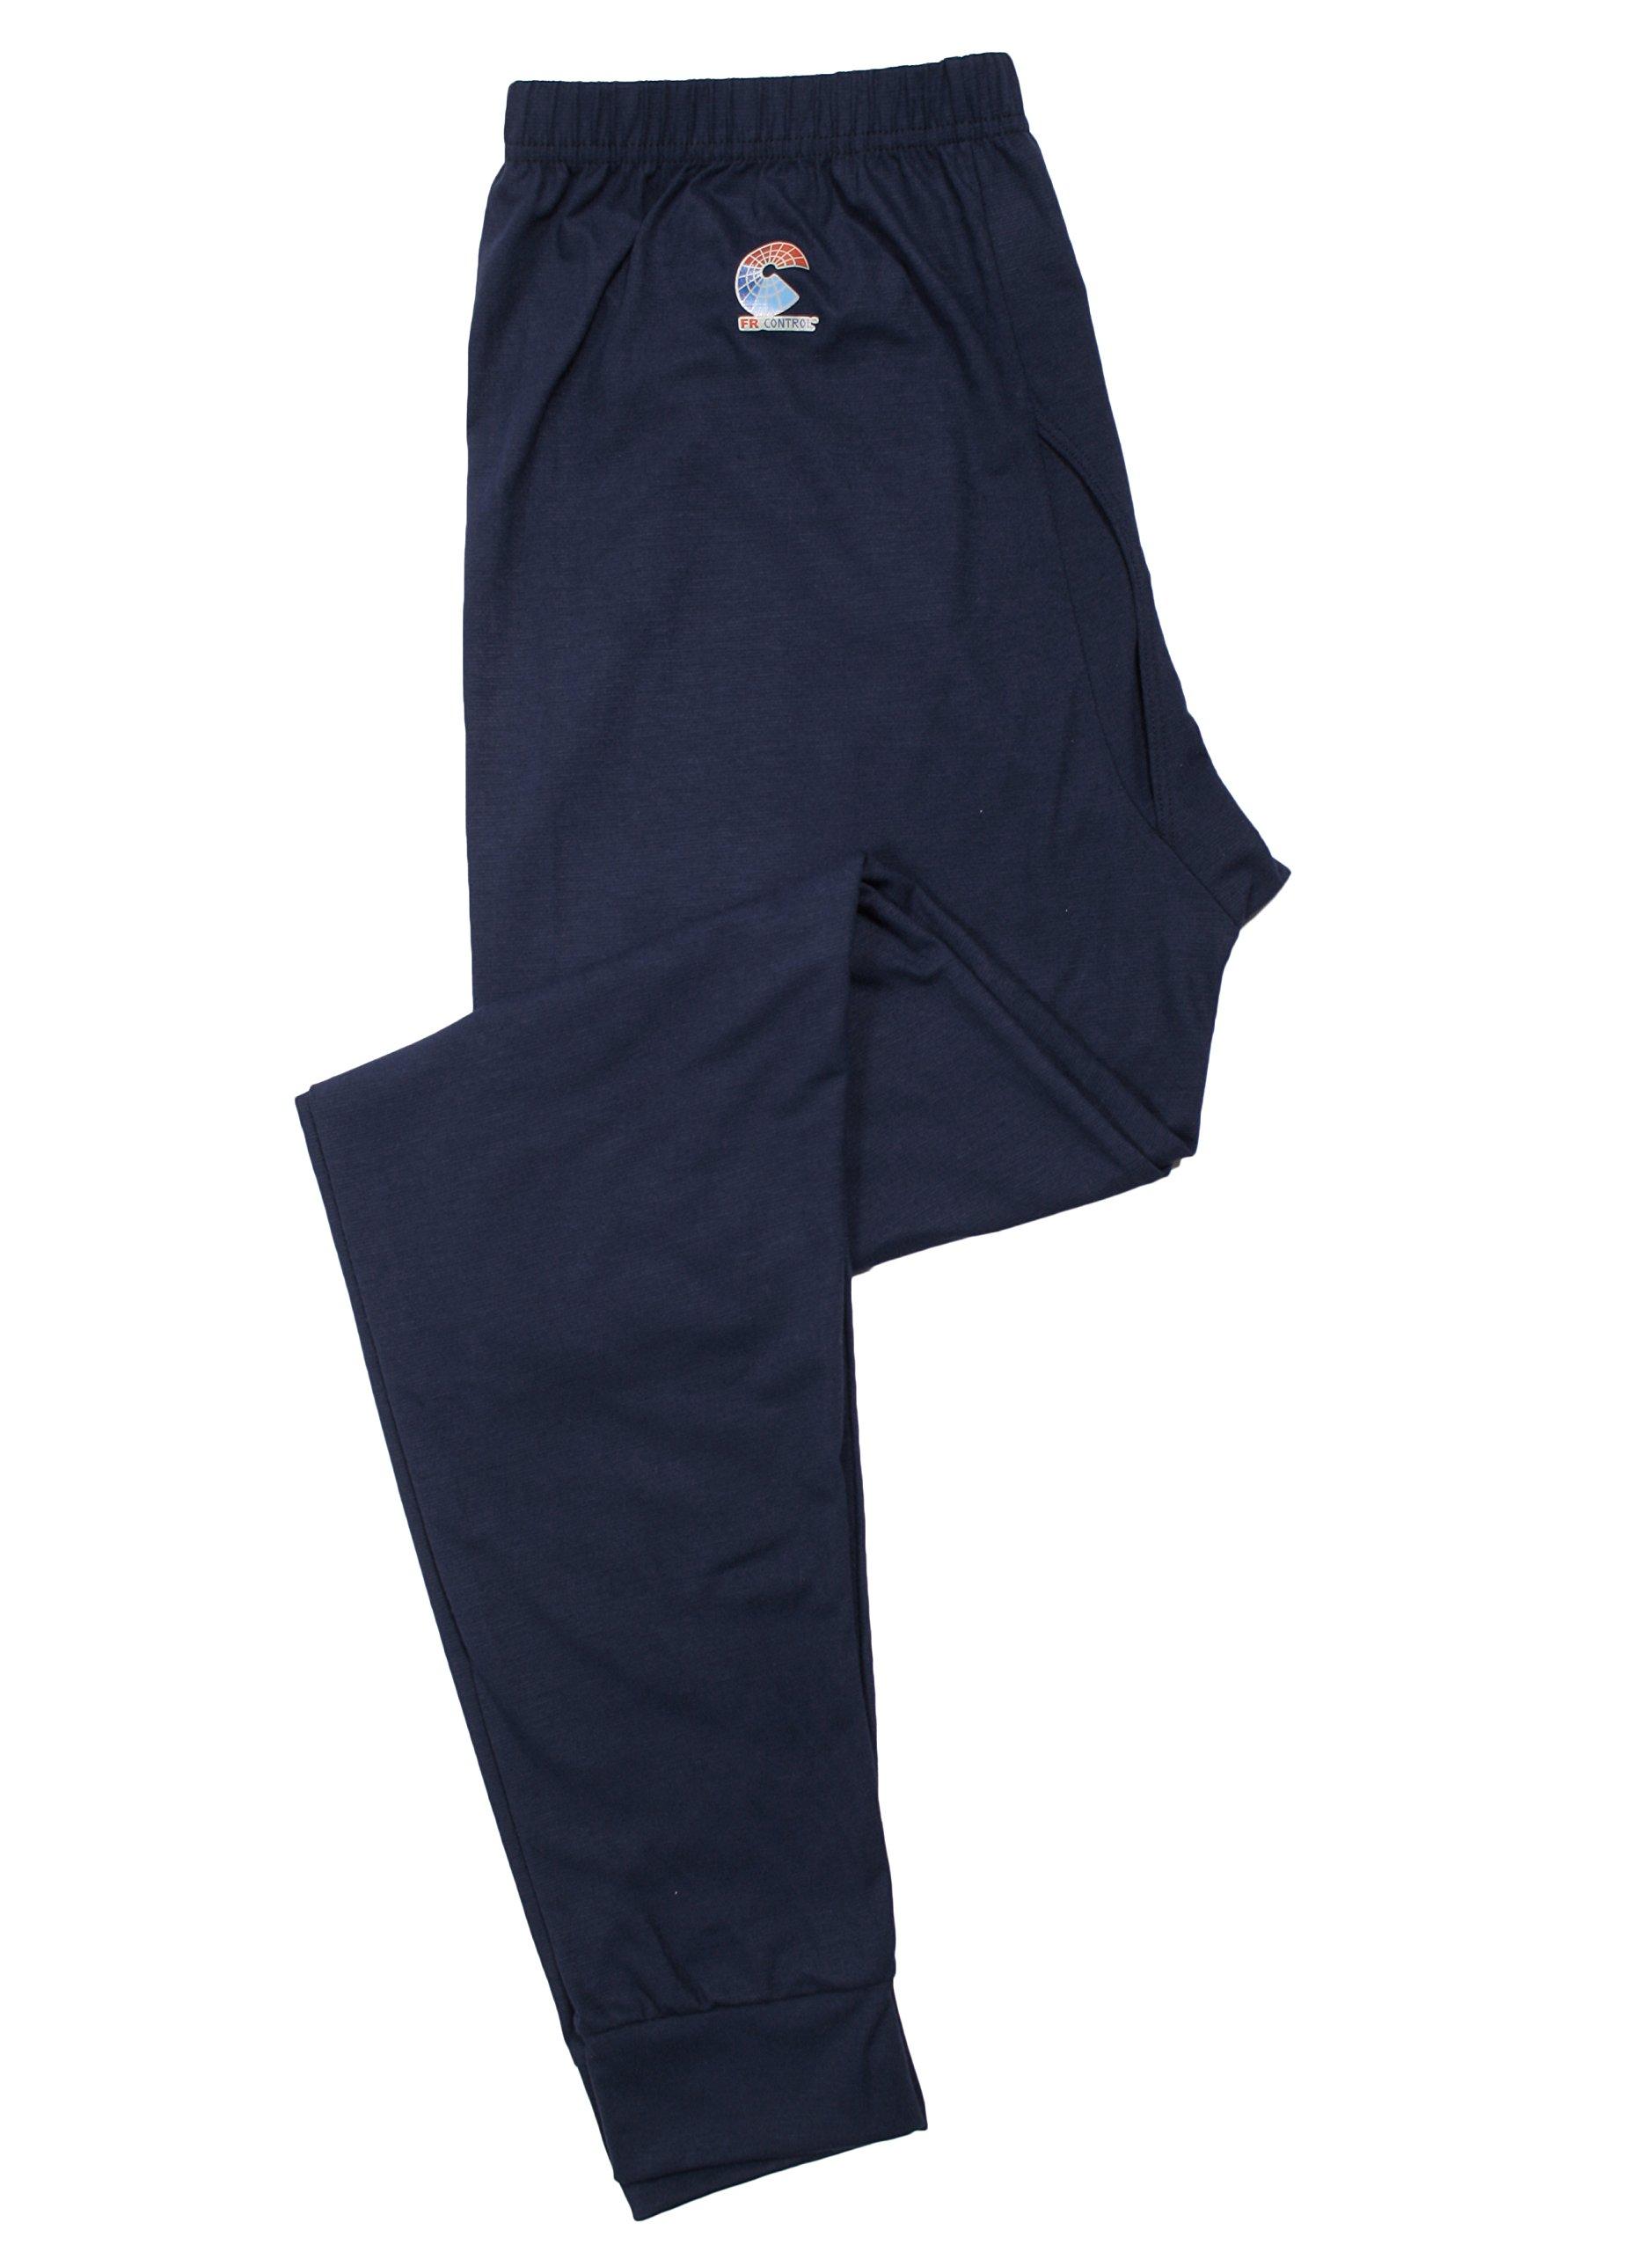 National Safety Apparel U52FKSRXL FR Control 2.0 Long Underwear Bottoms, Modacrylic Blend, X-Large, Navy